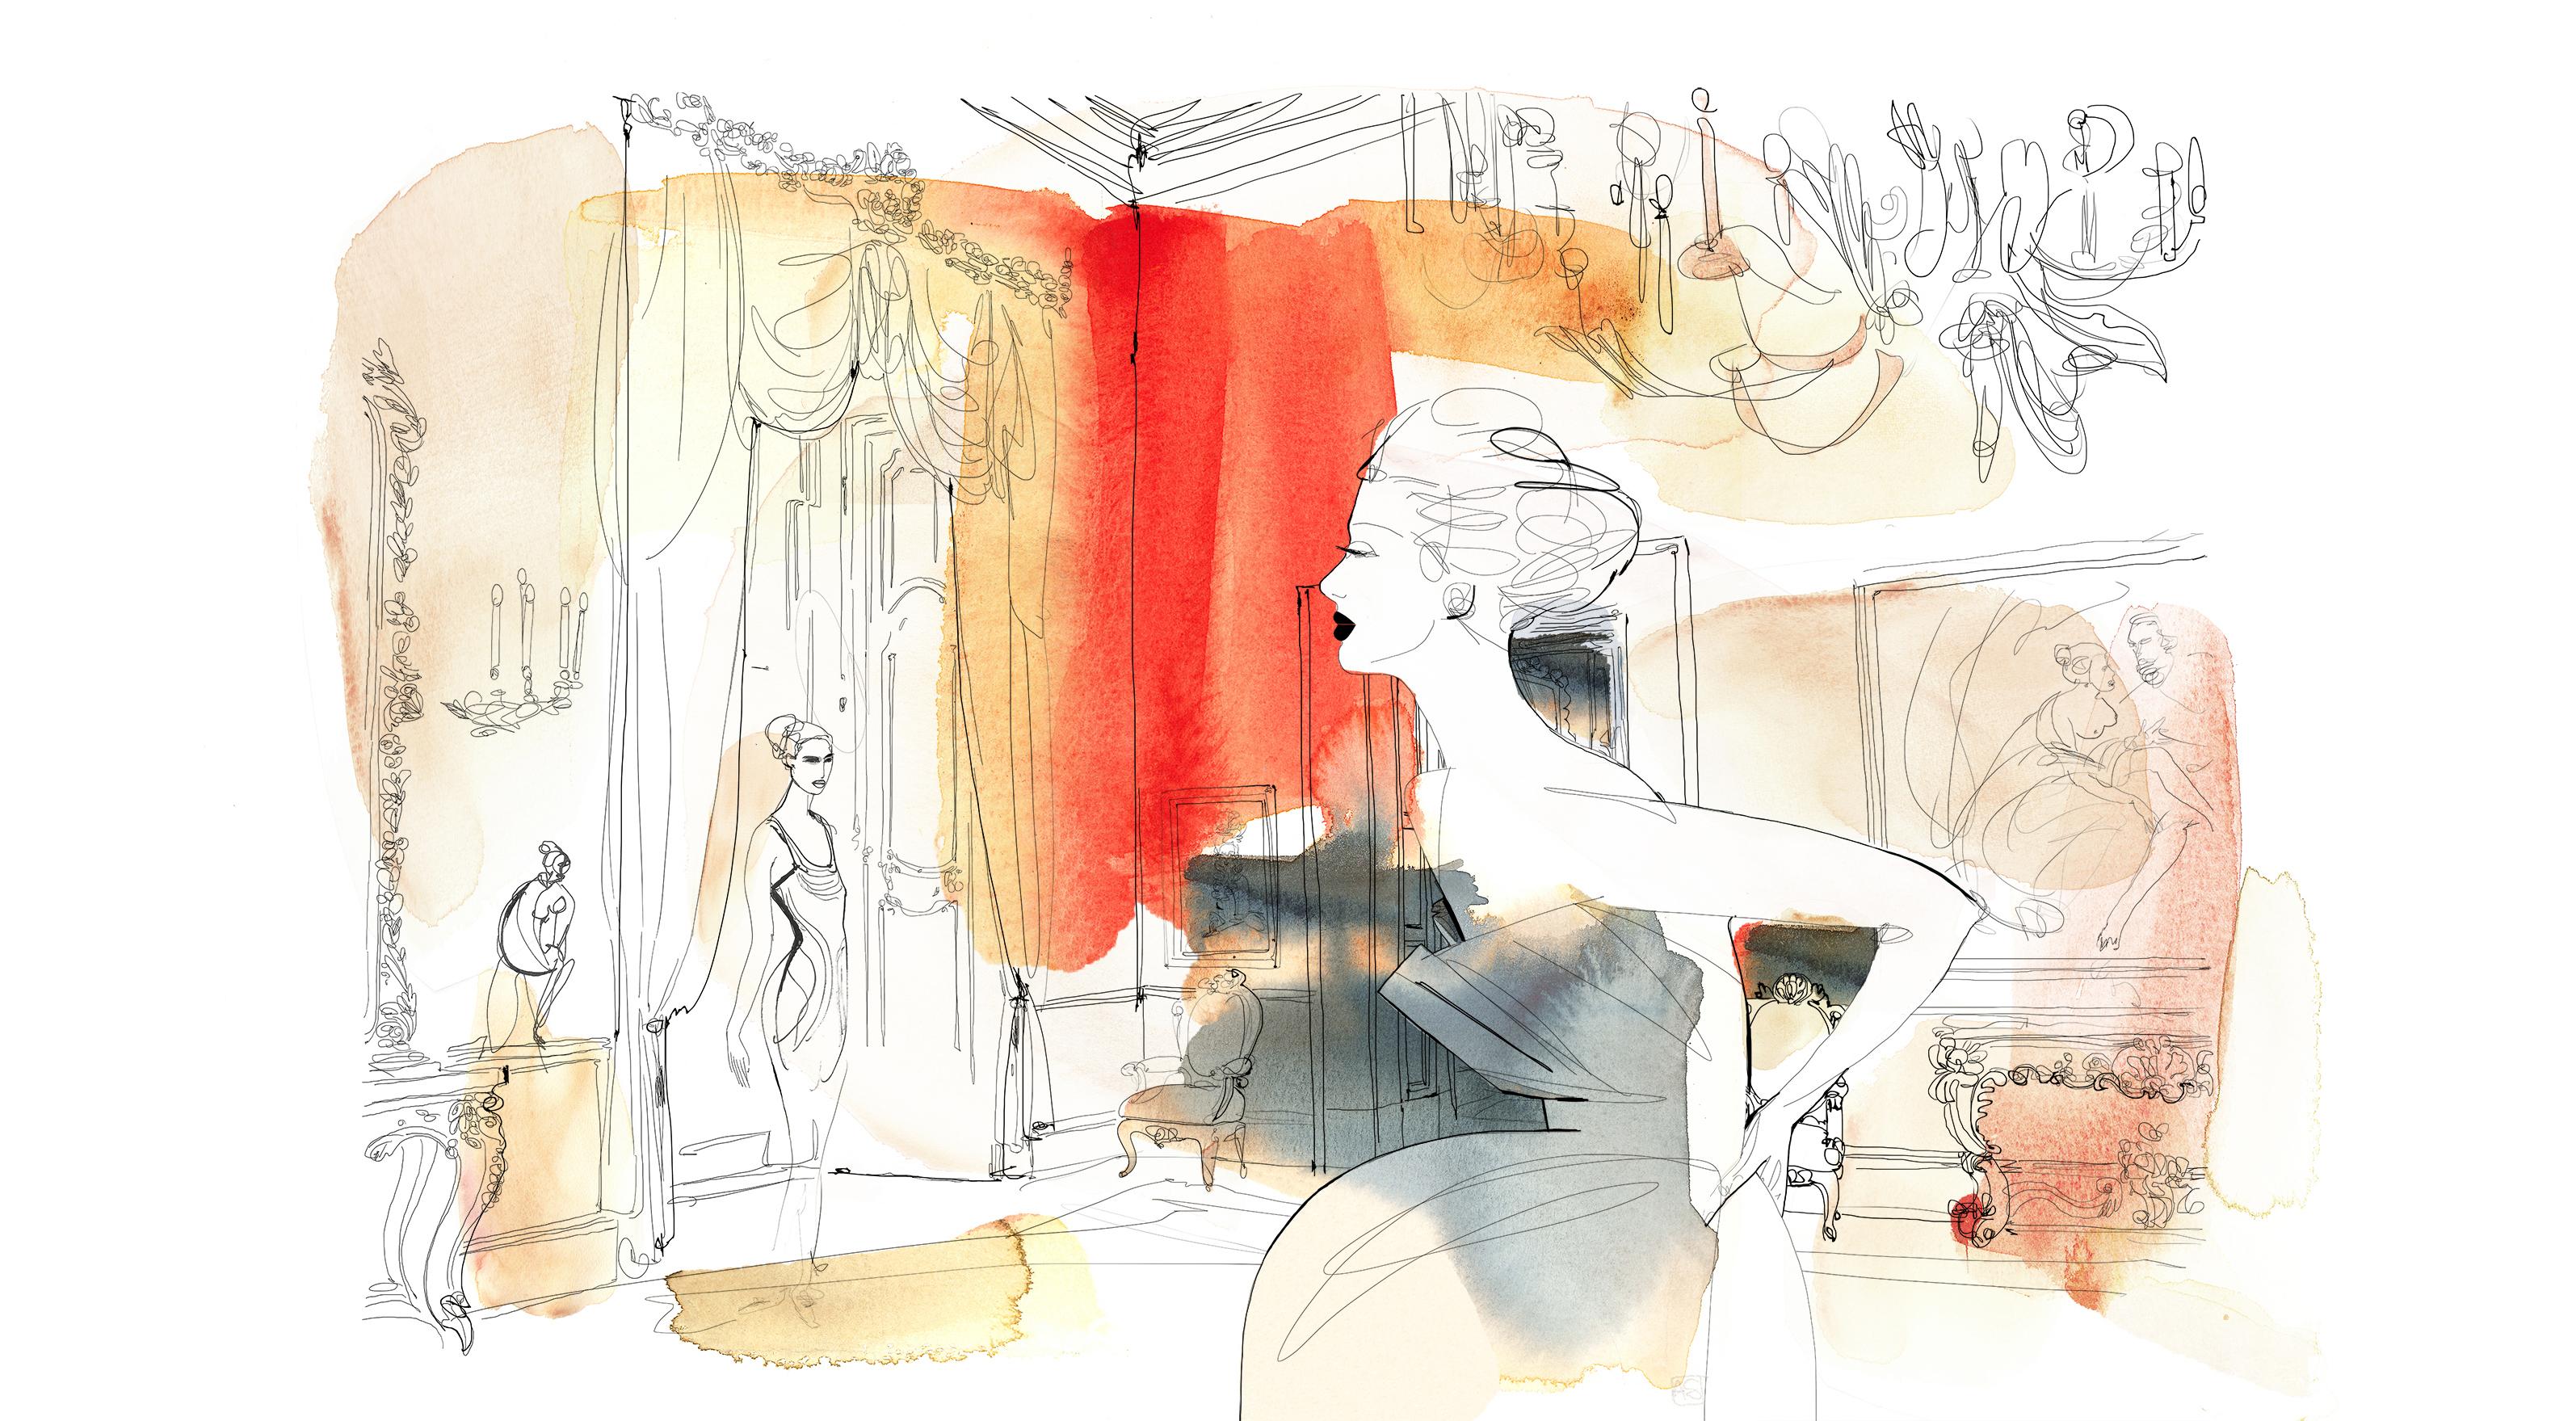 illustratori.it Alessandra Scandella: Gallerie d'Italia